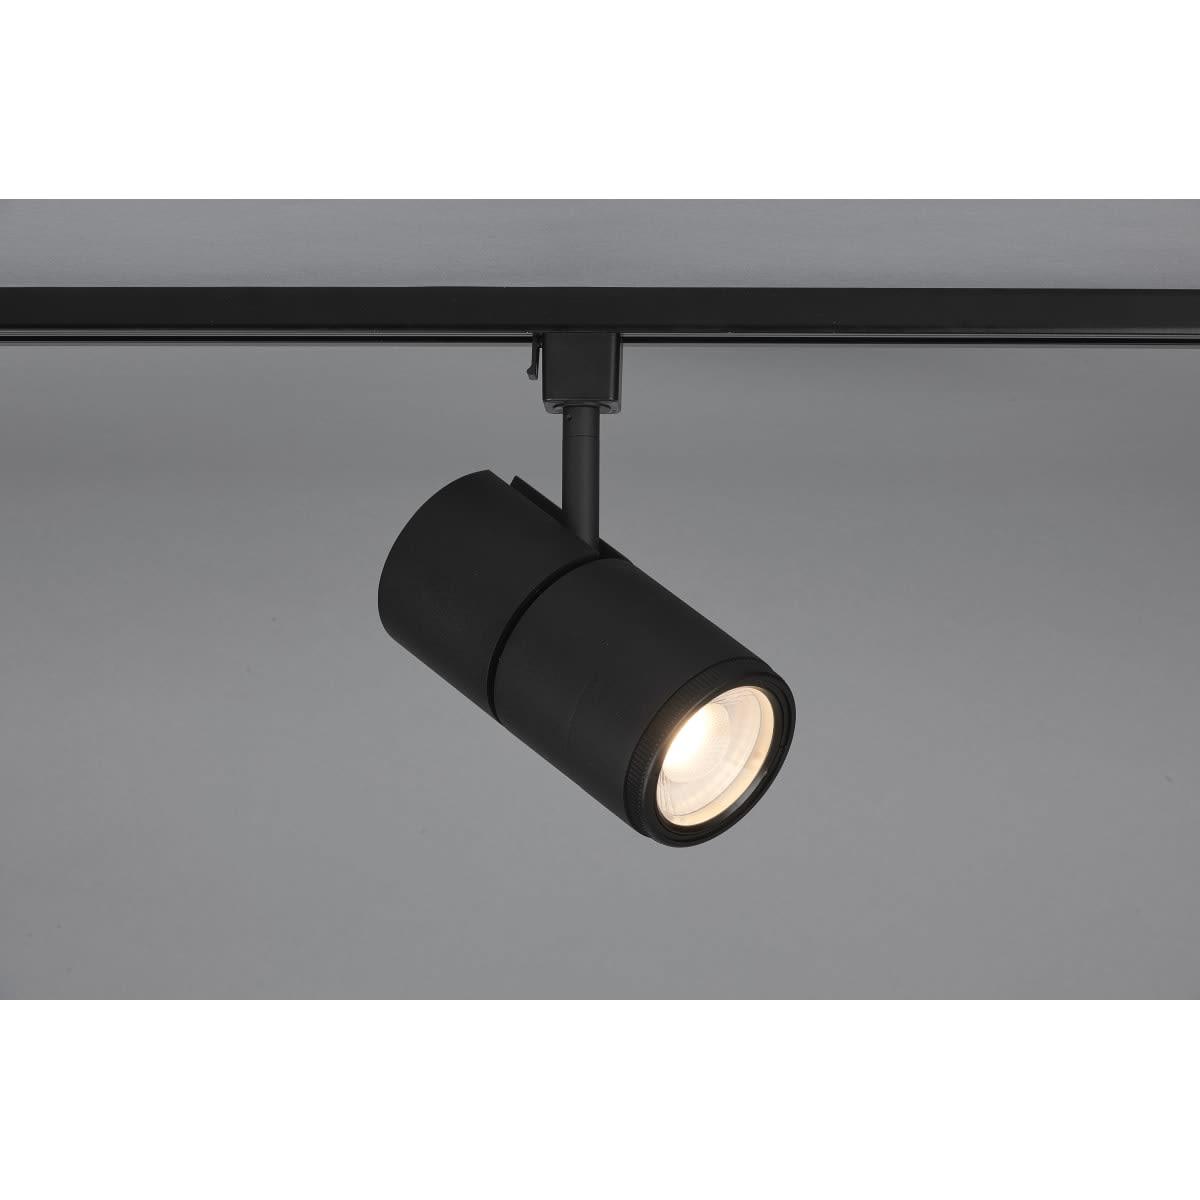 Bruck Lighting 350430 30k Eco